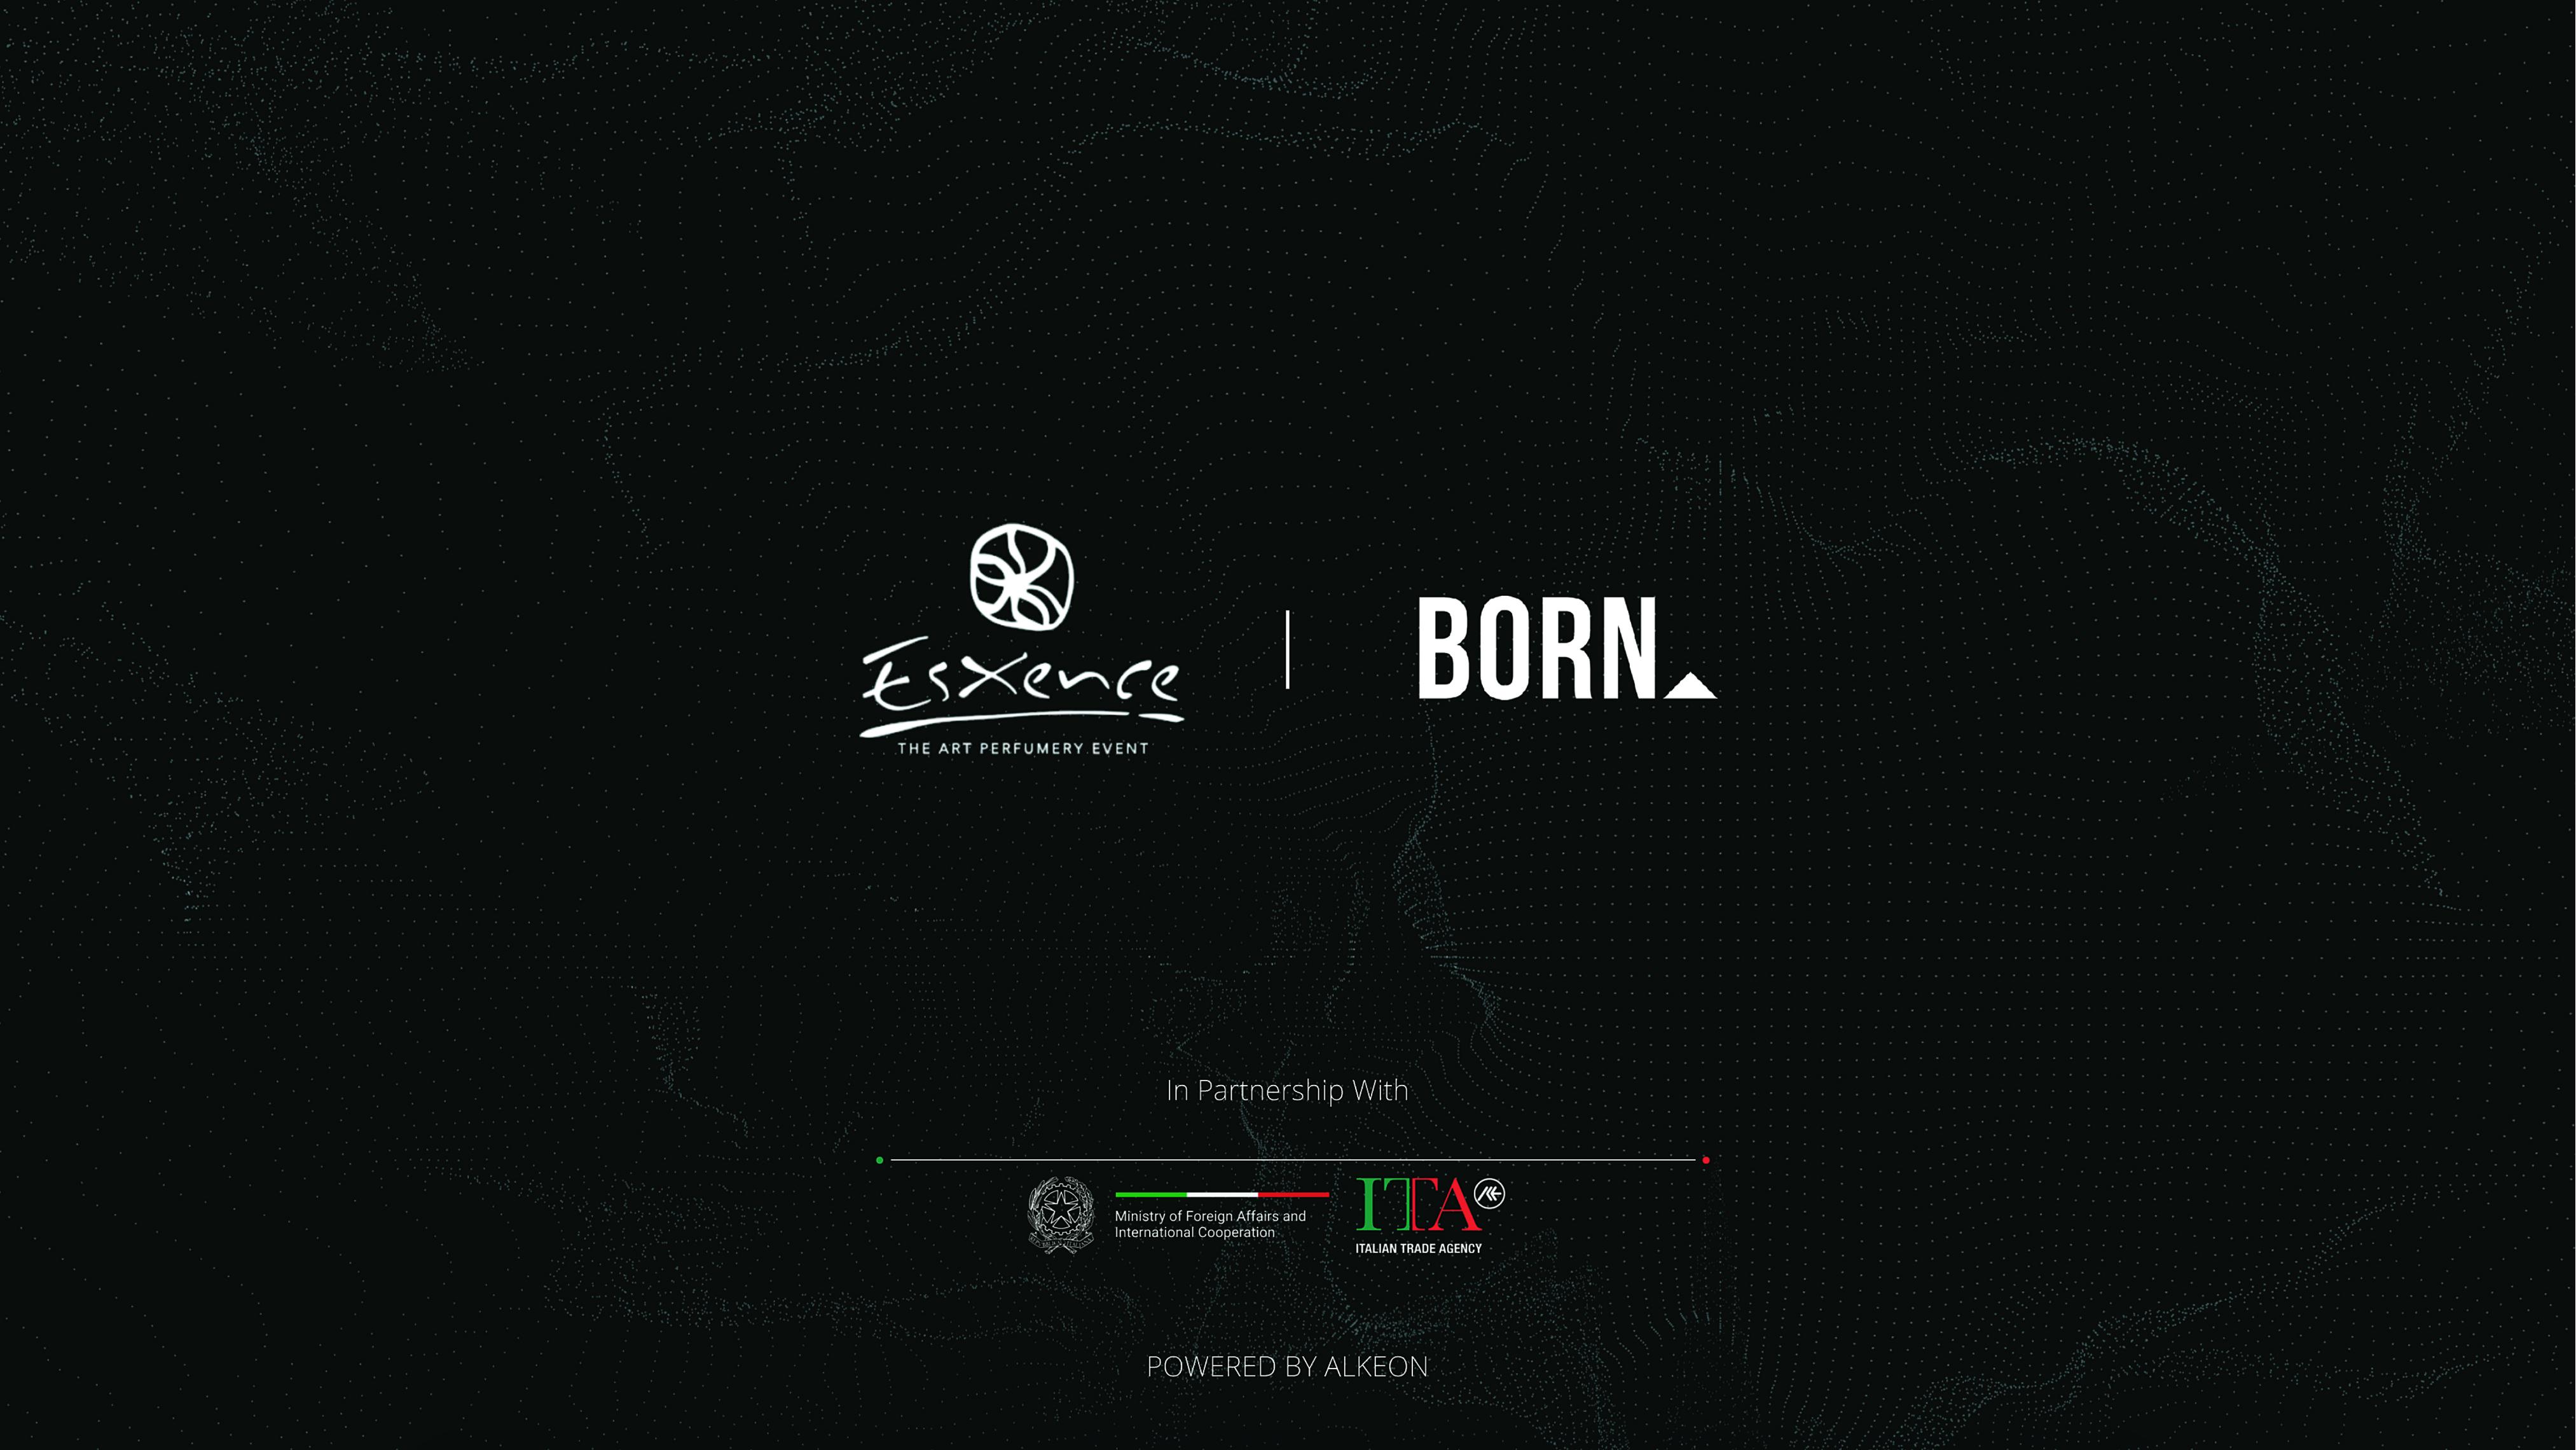 ESXENCE FOR BORN